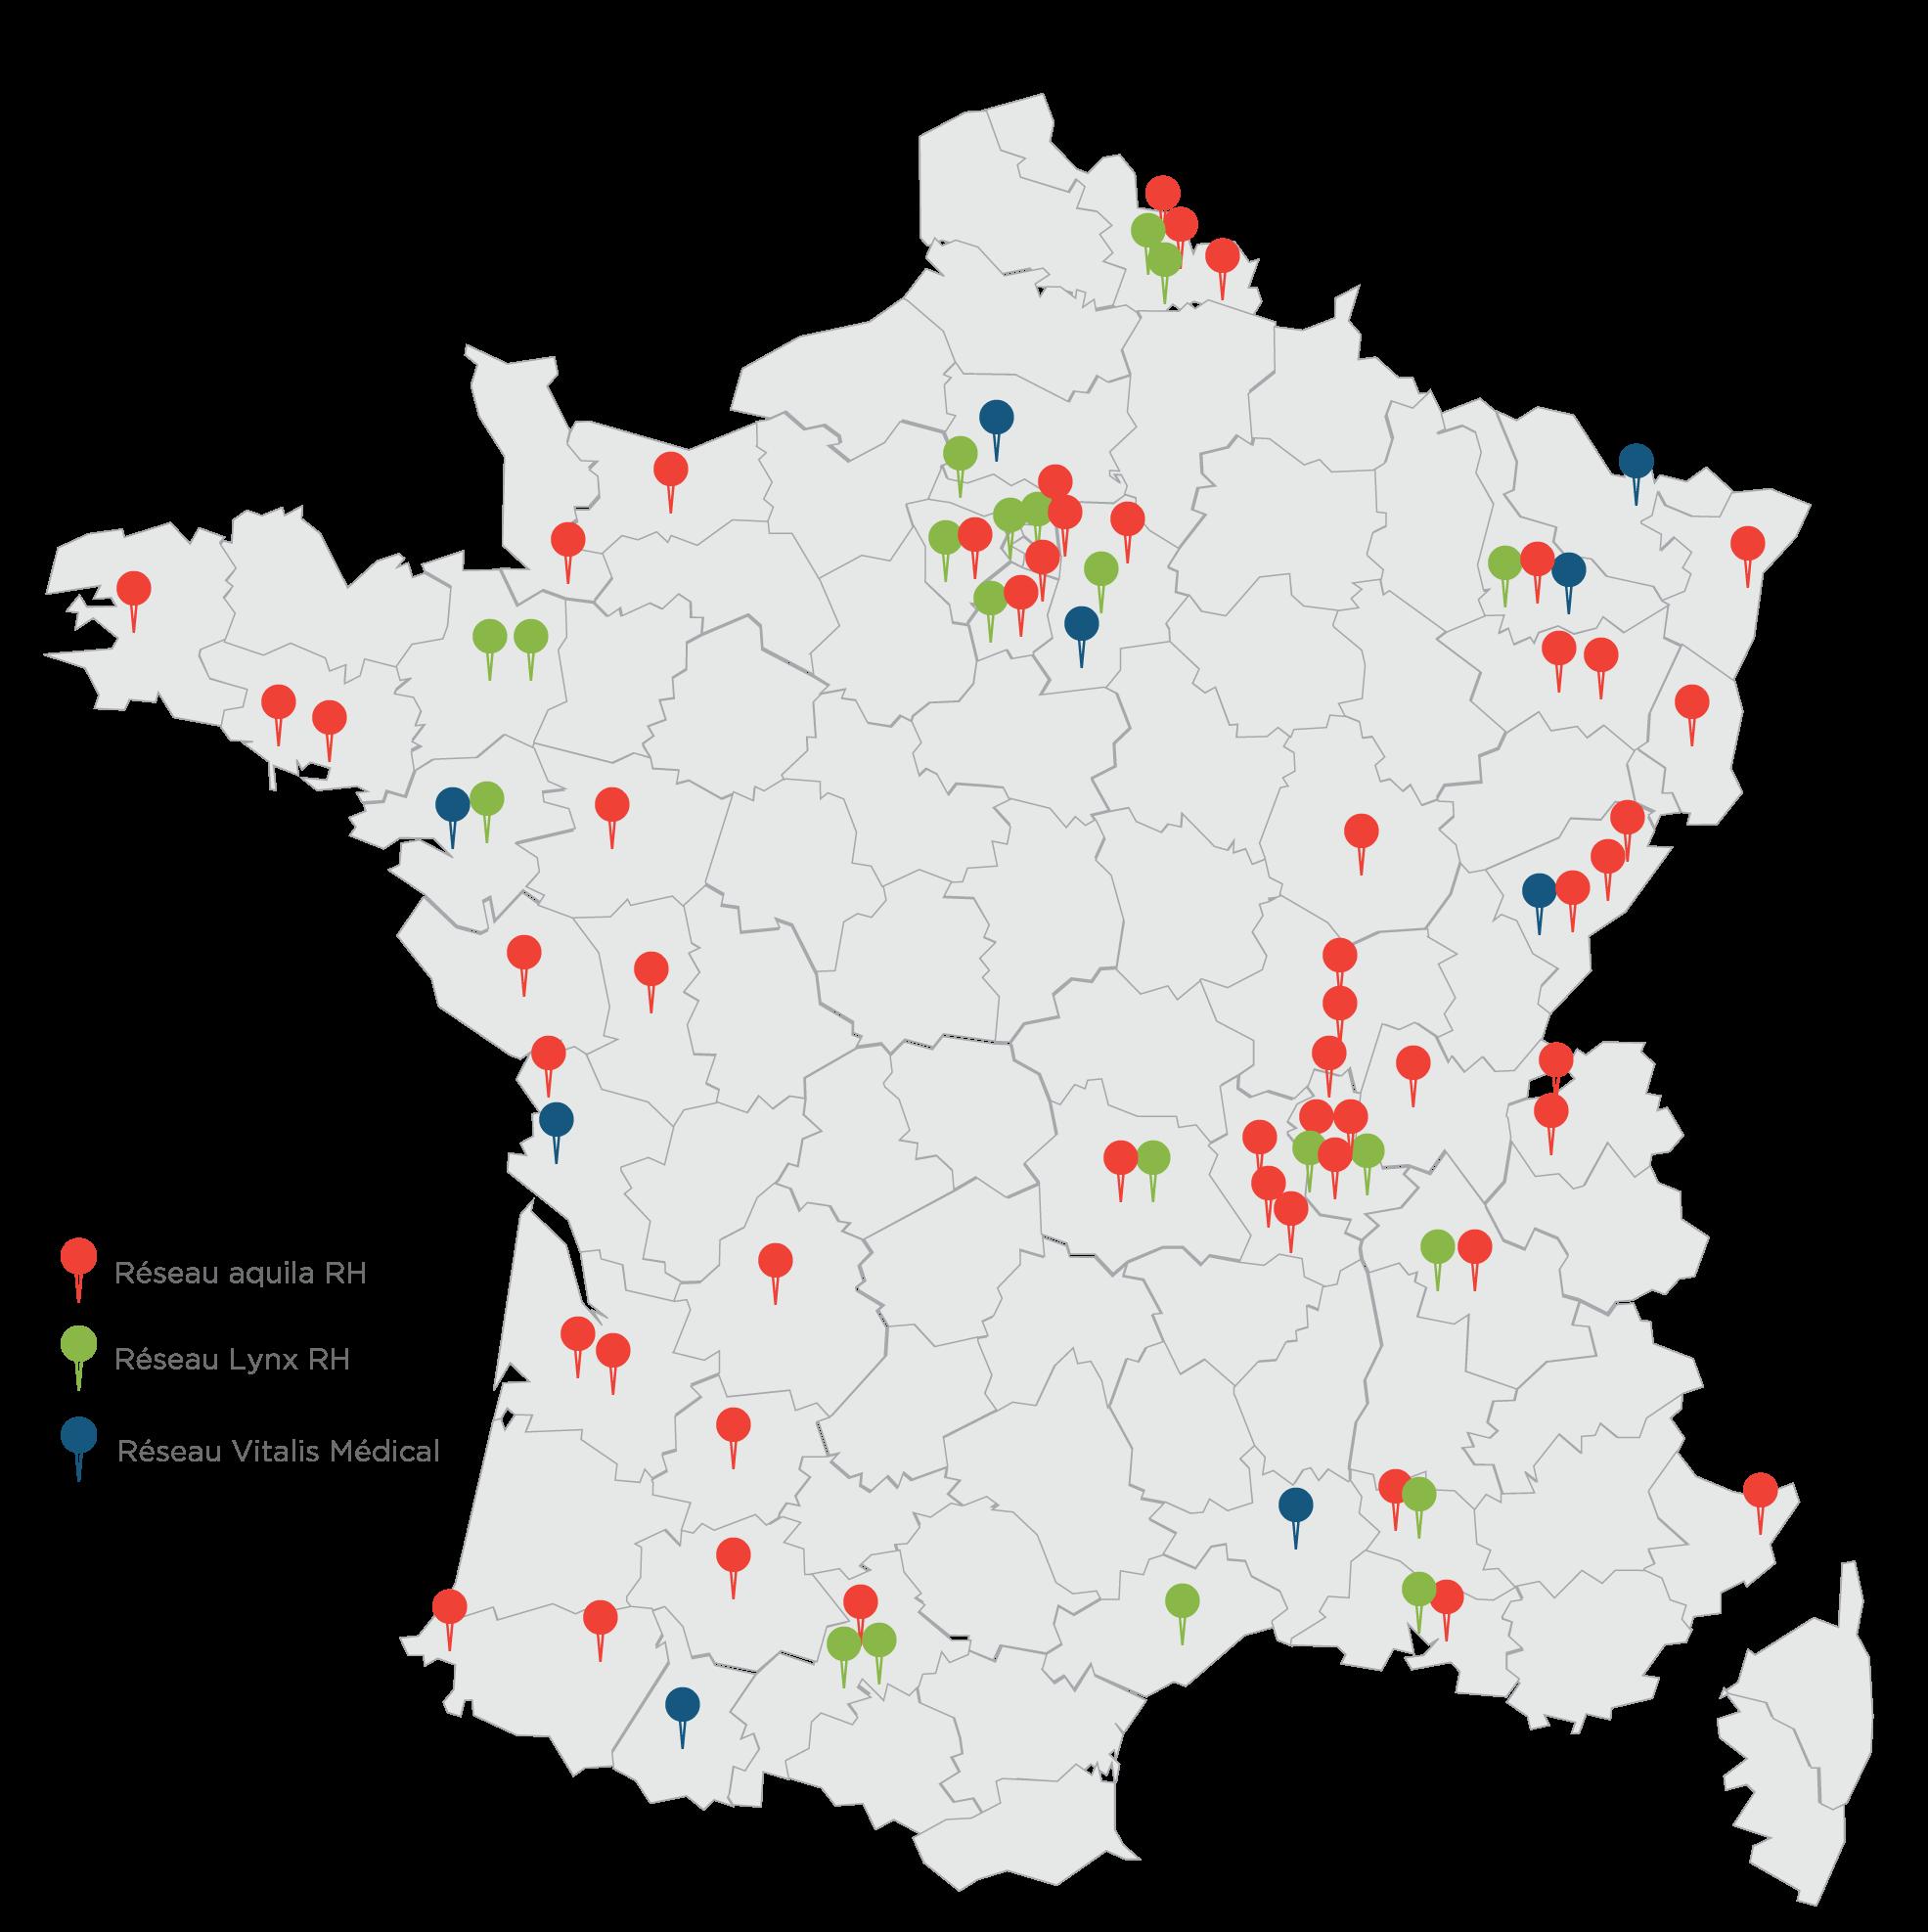 Carte-Réseaux-aquila-RH-Lynx-RH-Vitalis-Medical